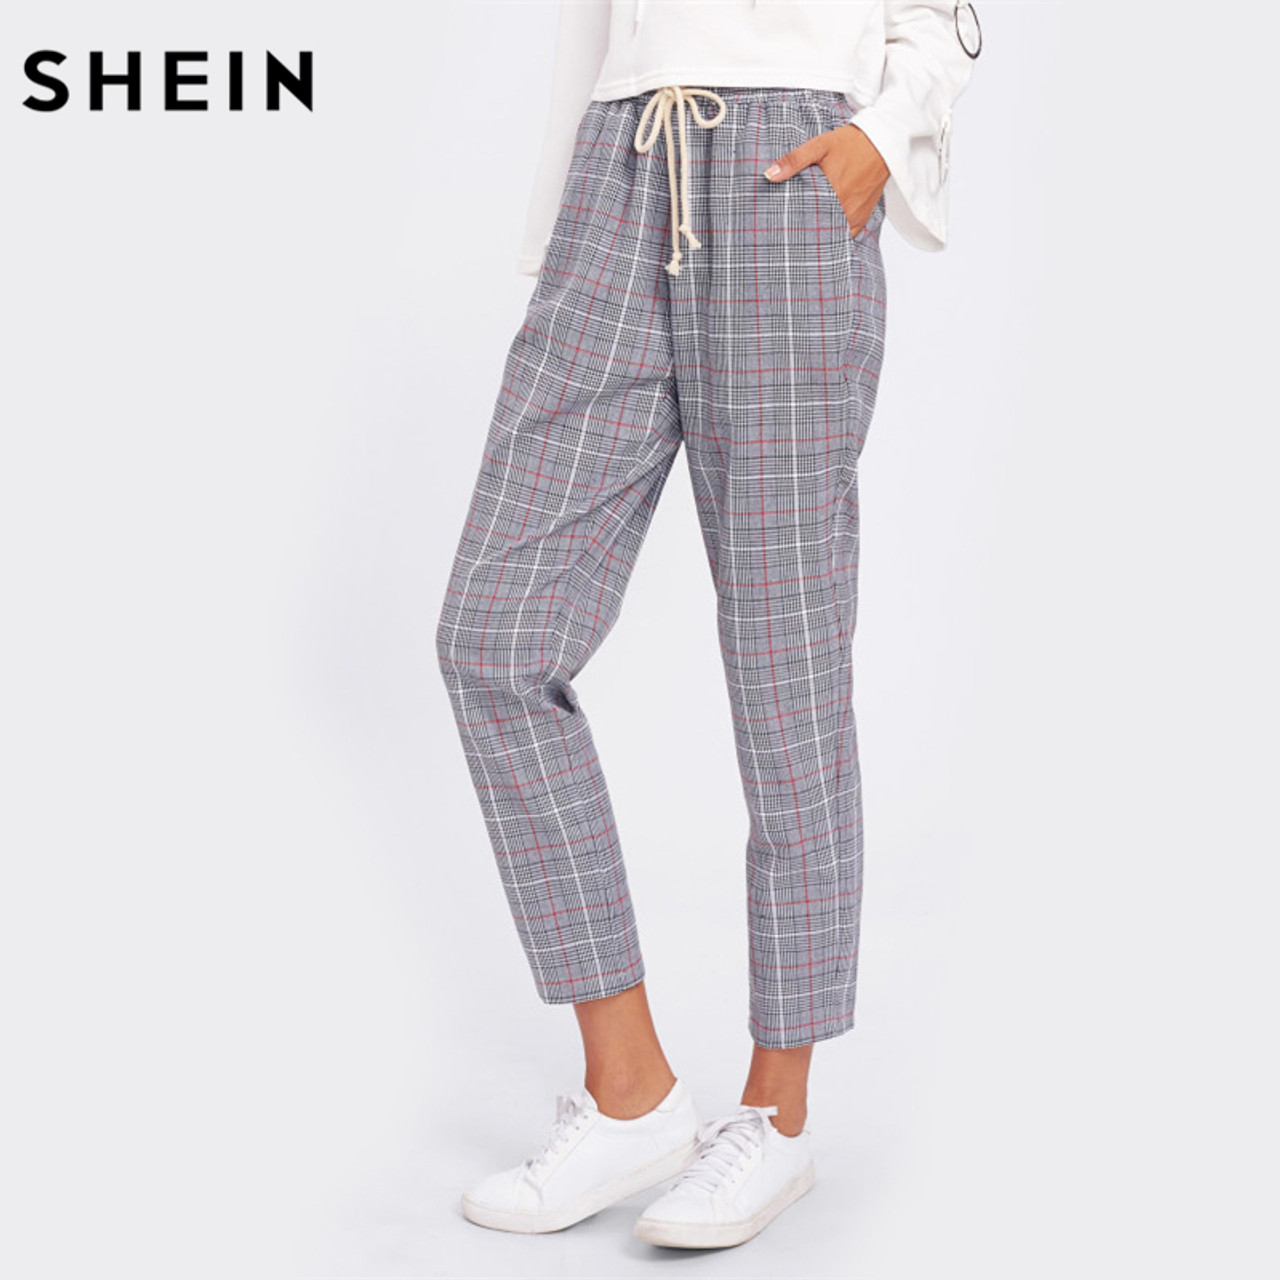 04426be58 SHEIN Drawstring Detail Plaid Peg Pants Grey High Waist Trousers Elastic  Waist Loose Cropped Womens Casual ...